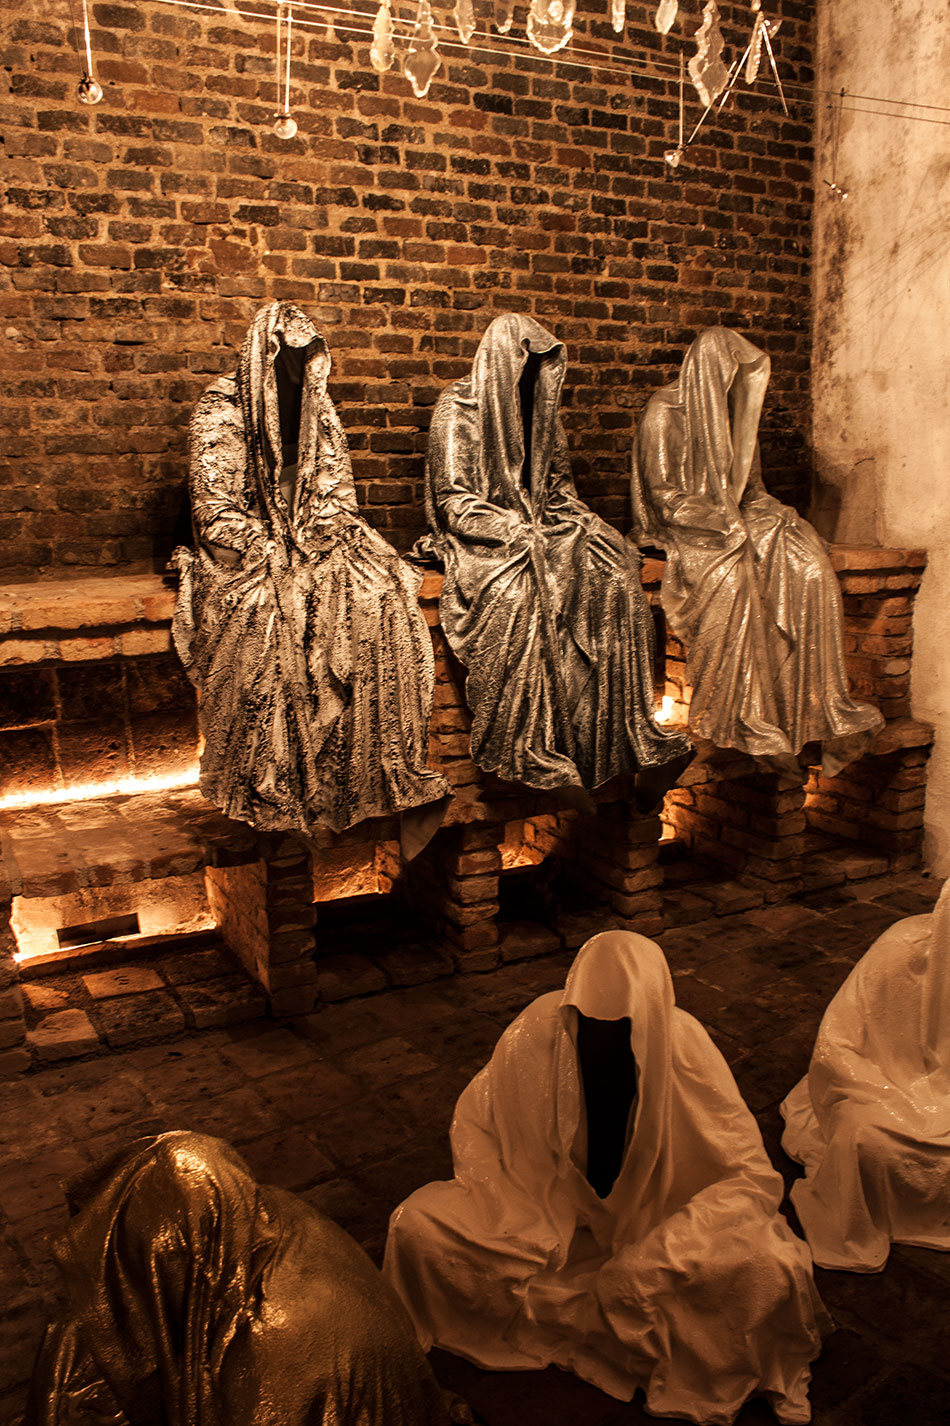 wine-cellar-galerie-artdealer--freller-guardians-of-time-manfred-kili-kielnhofer-contemporary-art-arts-light-design-sculpture-antique-show-statue-7921